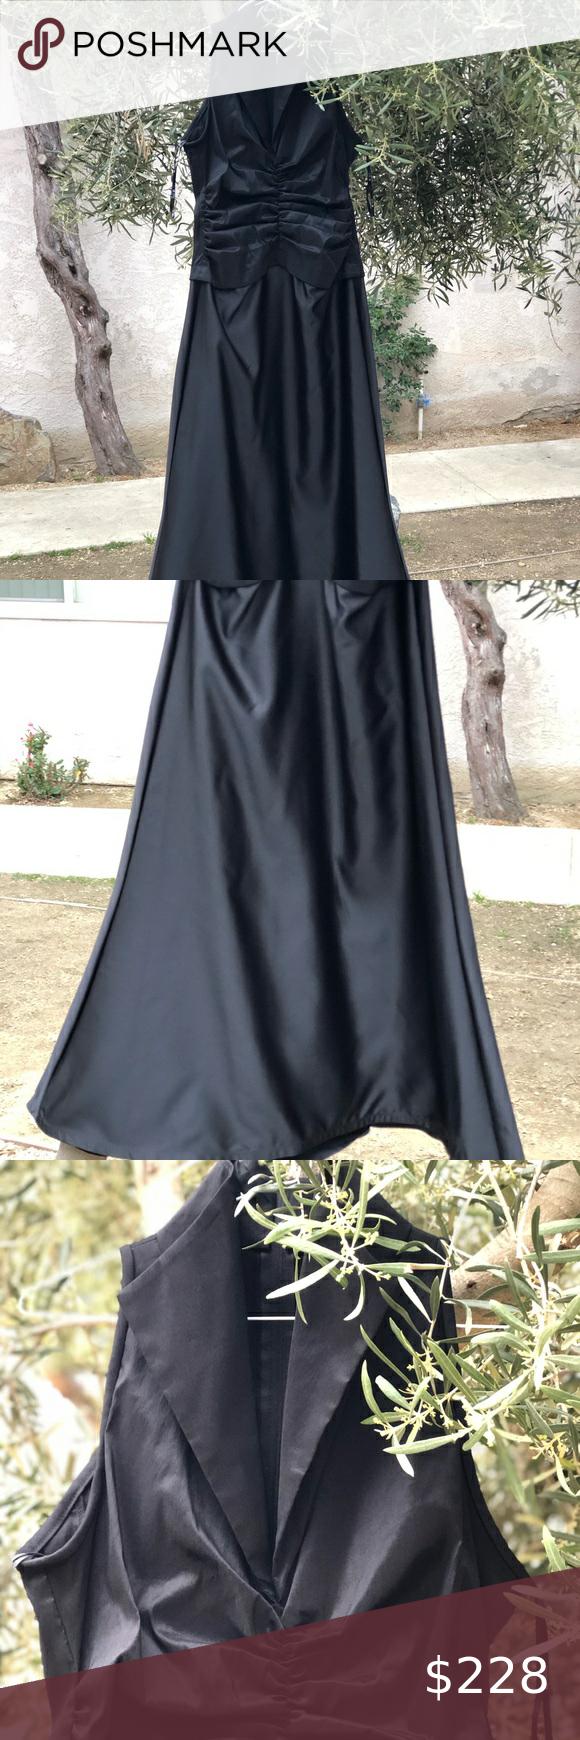 Nwot Tadashi Shoji Black Dress Front Gown Size 8 Tadashi Shoji Black Dress Tadashi Black Dress Dresses [ 1740 x 580 Pixel ]